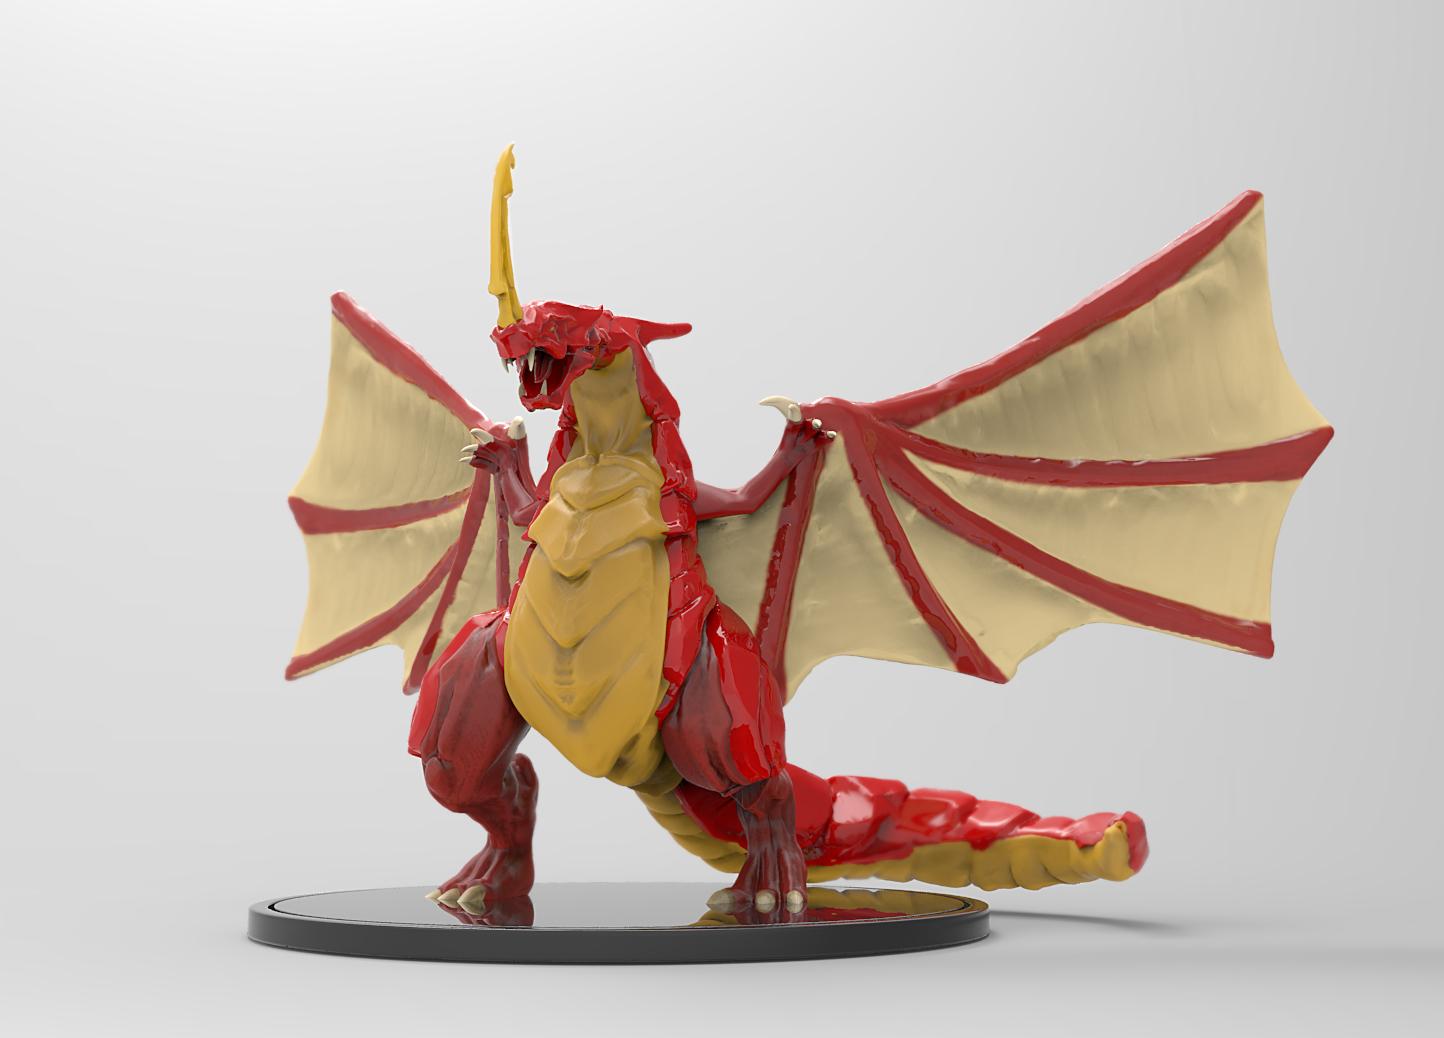 Drago_Toy_Render.jpg